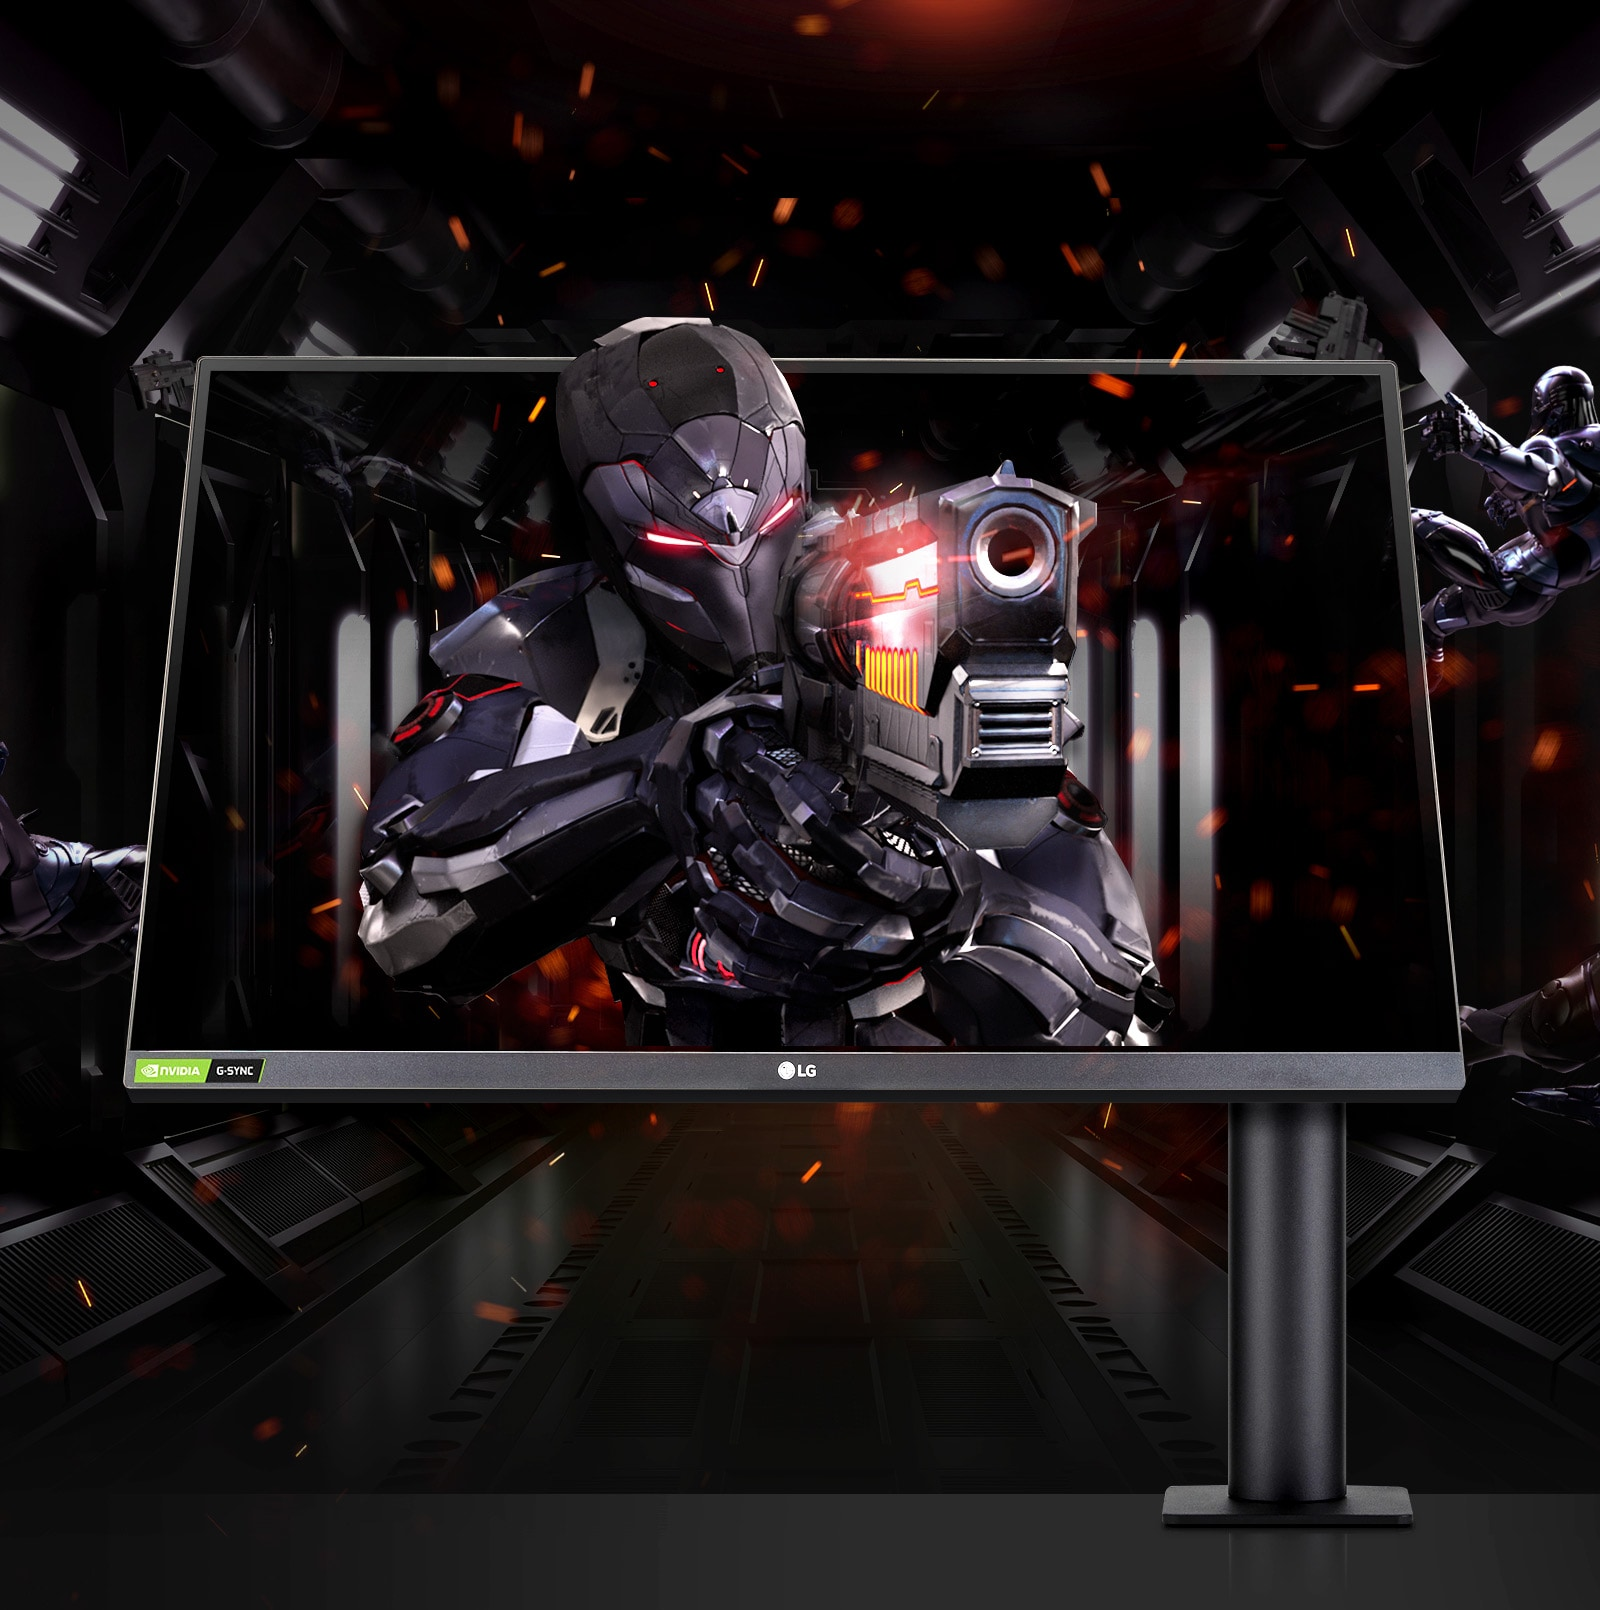 LG UltraGear monitor as the powerful gaming display